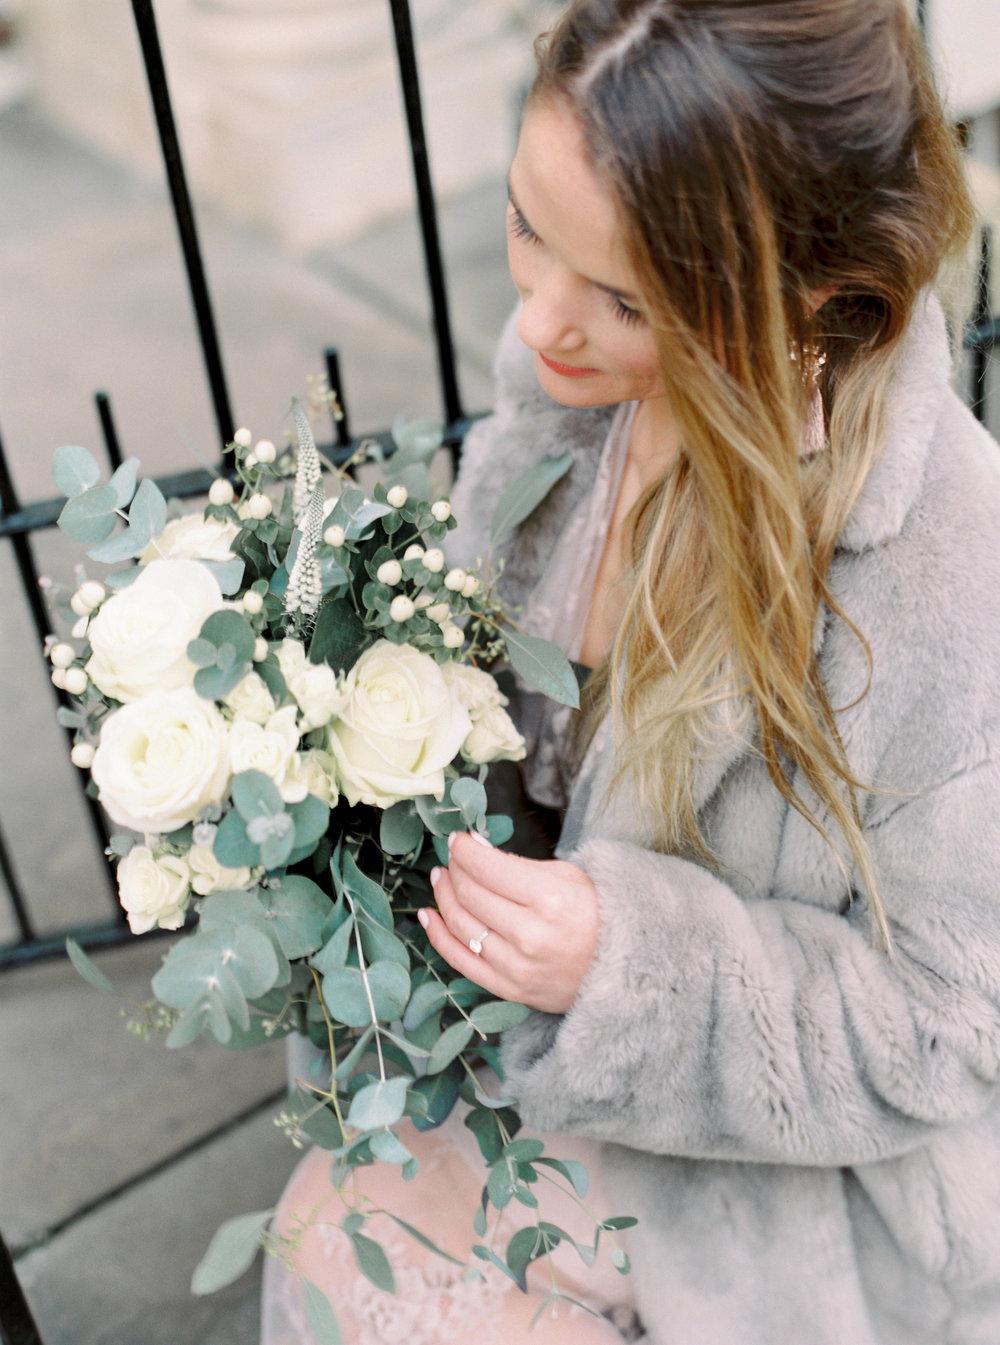 Luxury Wedding Planner UK | Our Chic & Romantic Engagement Shoot in Bath | Katie Julia Photography - 1.JPG